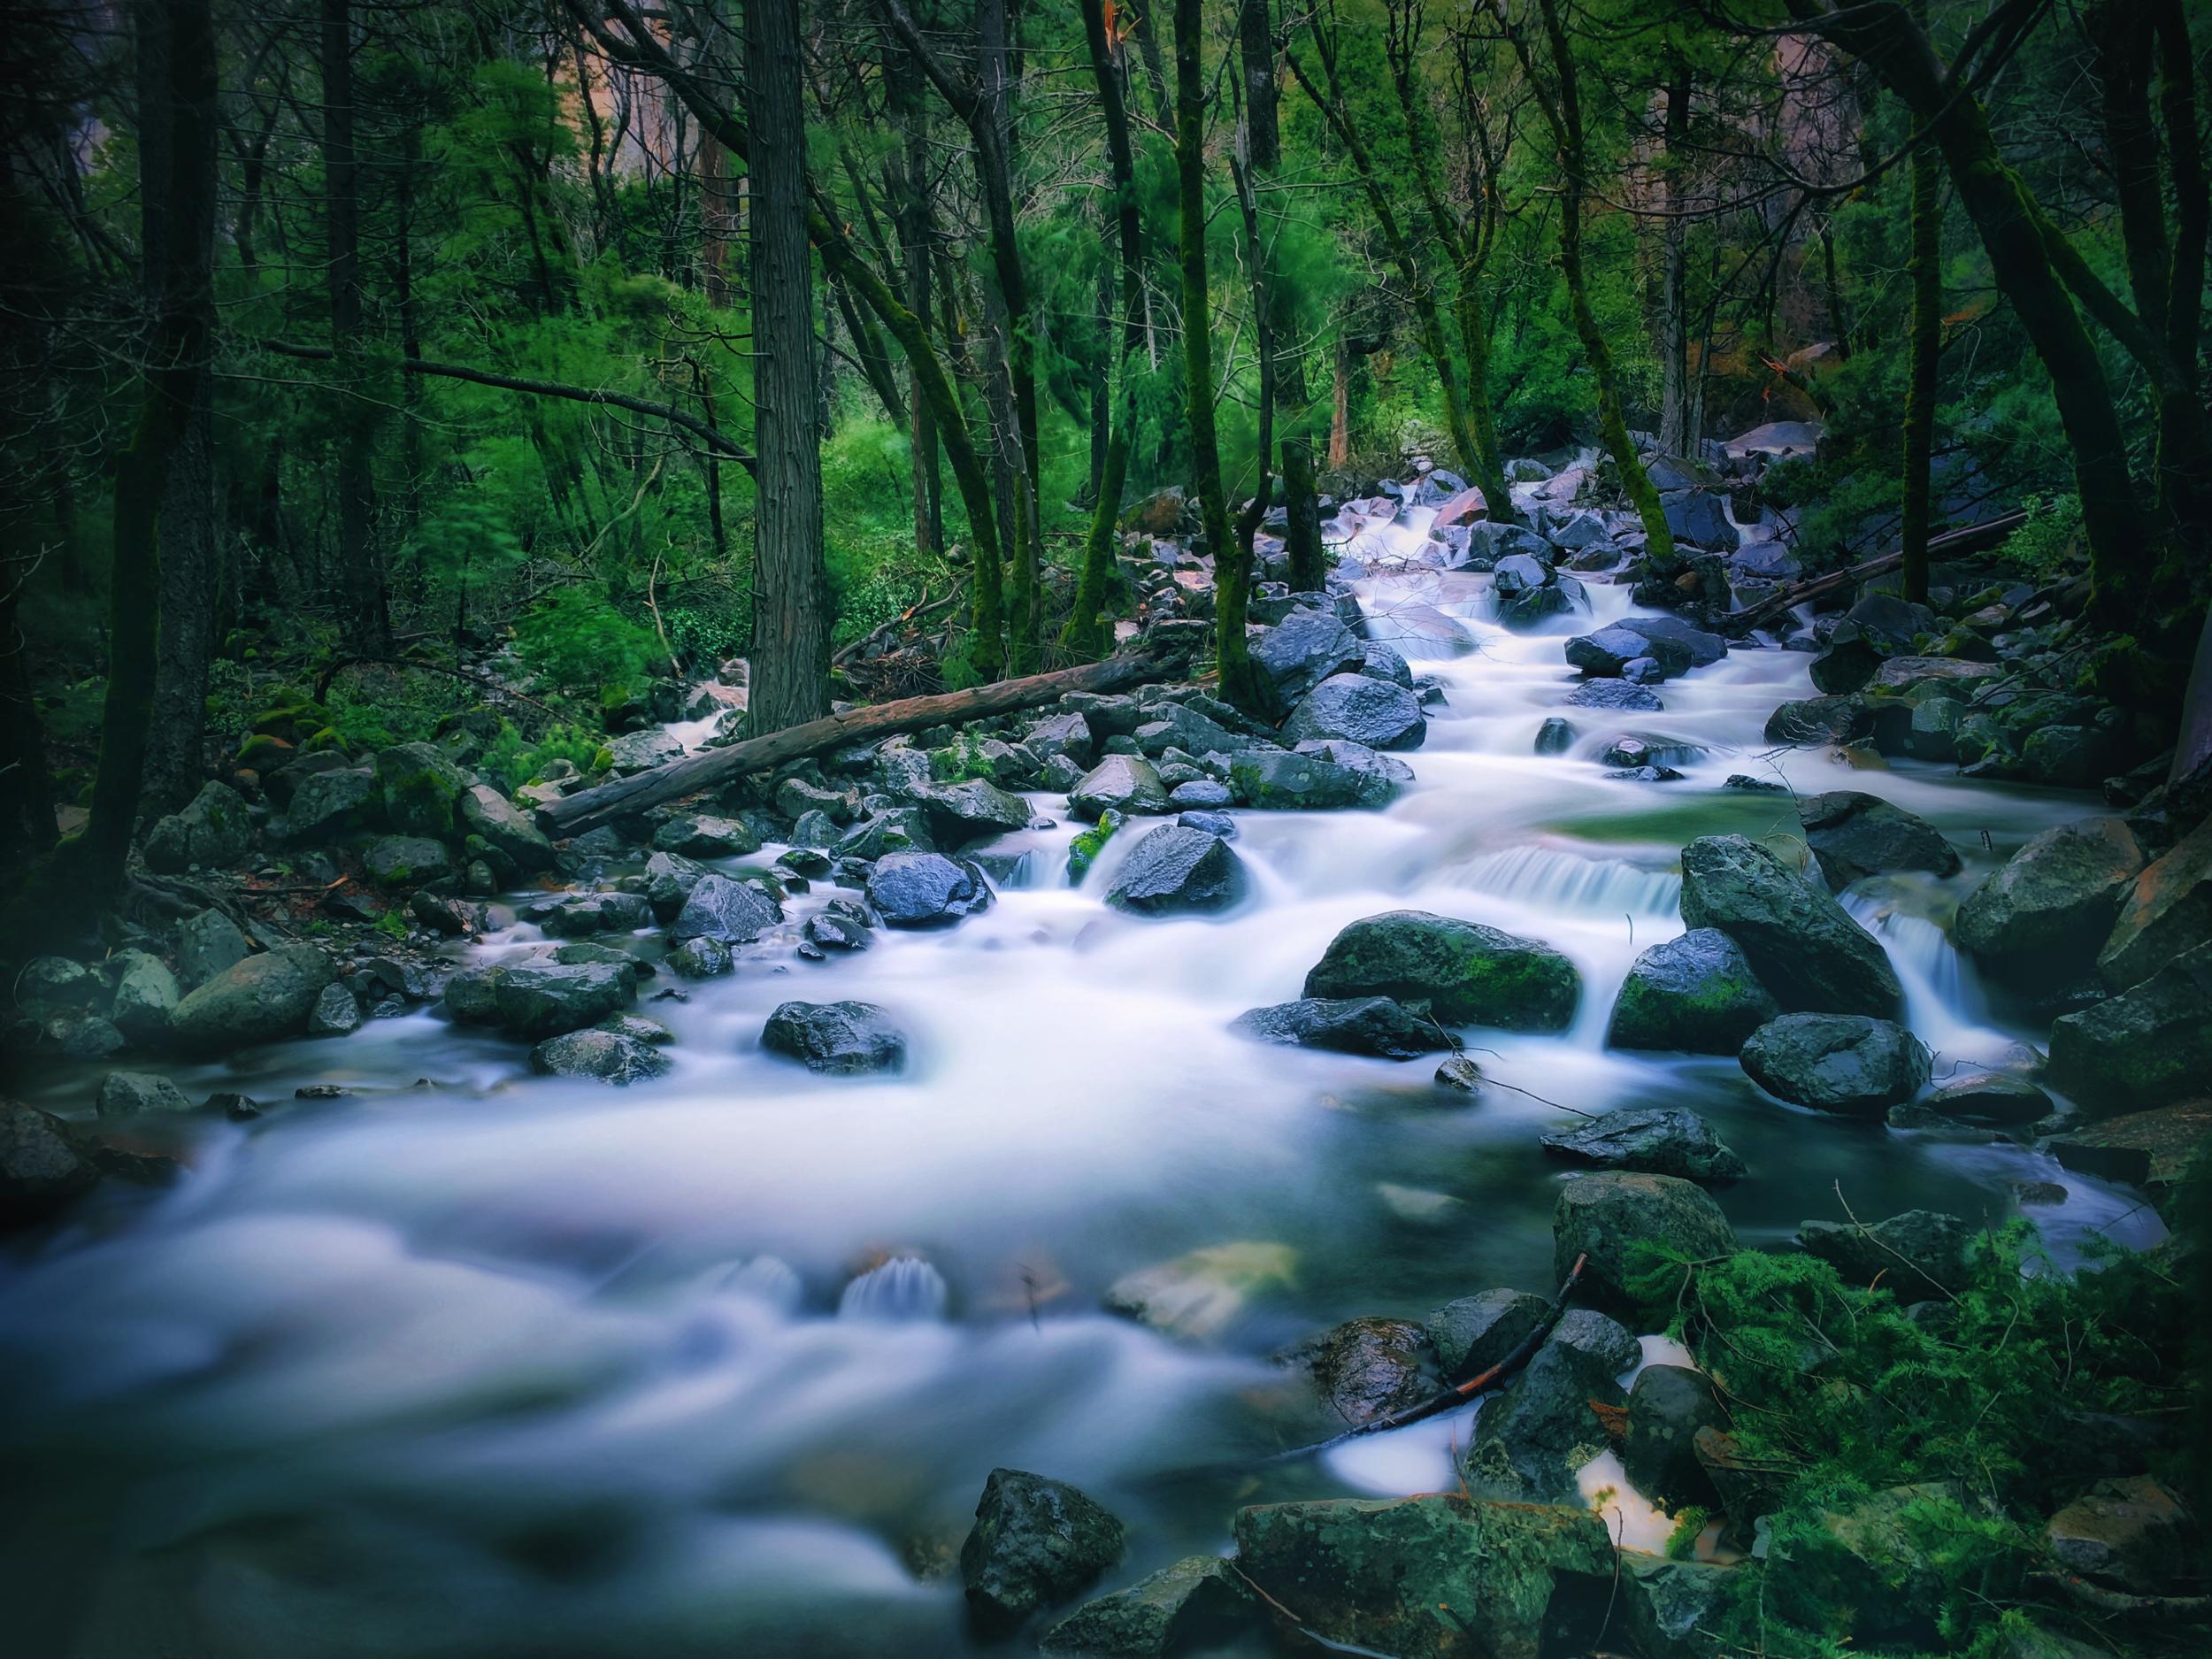 Bridalveil creek @ Yosemite national park